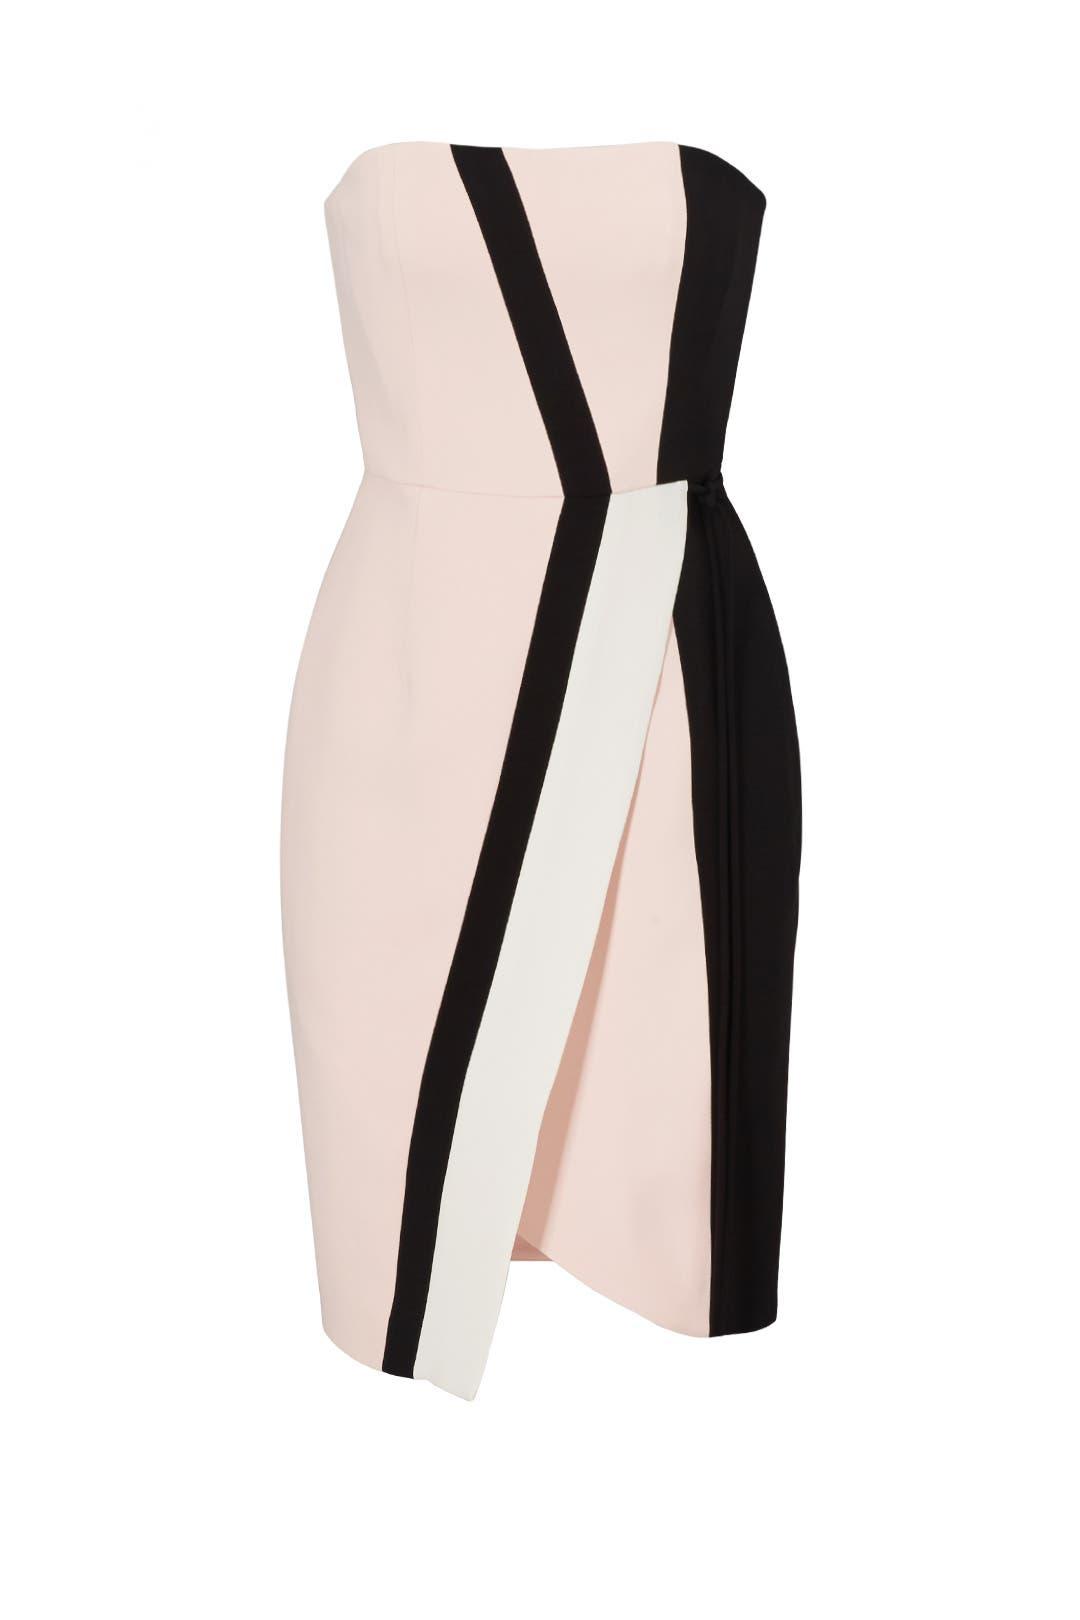 Pink Asymmetric Graphic Crepe Dress by J. Mendel